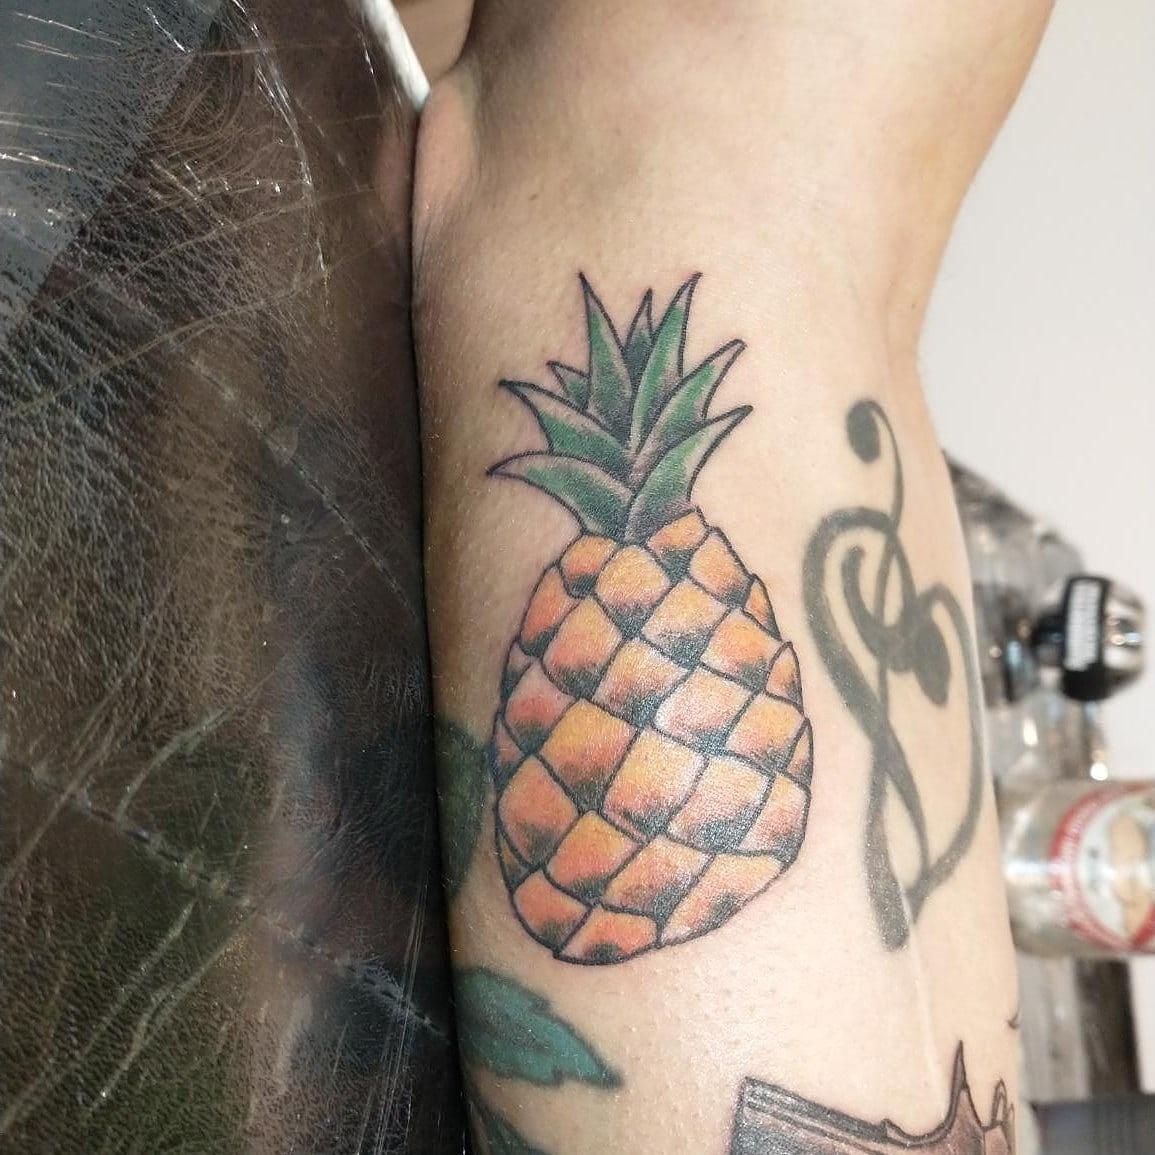 Pineapple Tattoo Design Good Times Tattoo Seattle